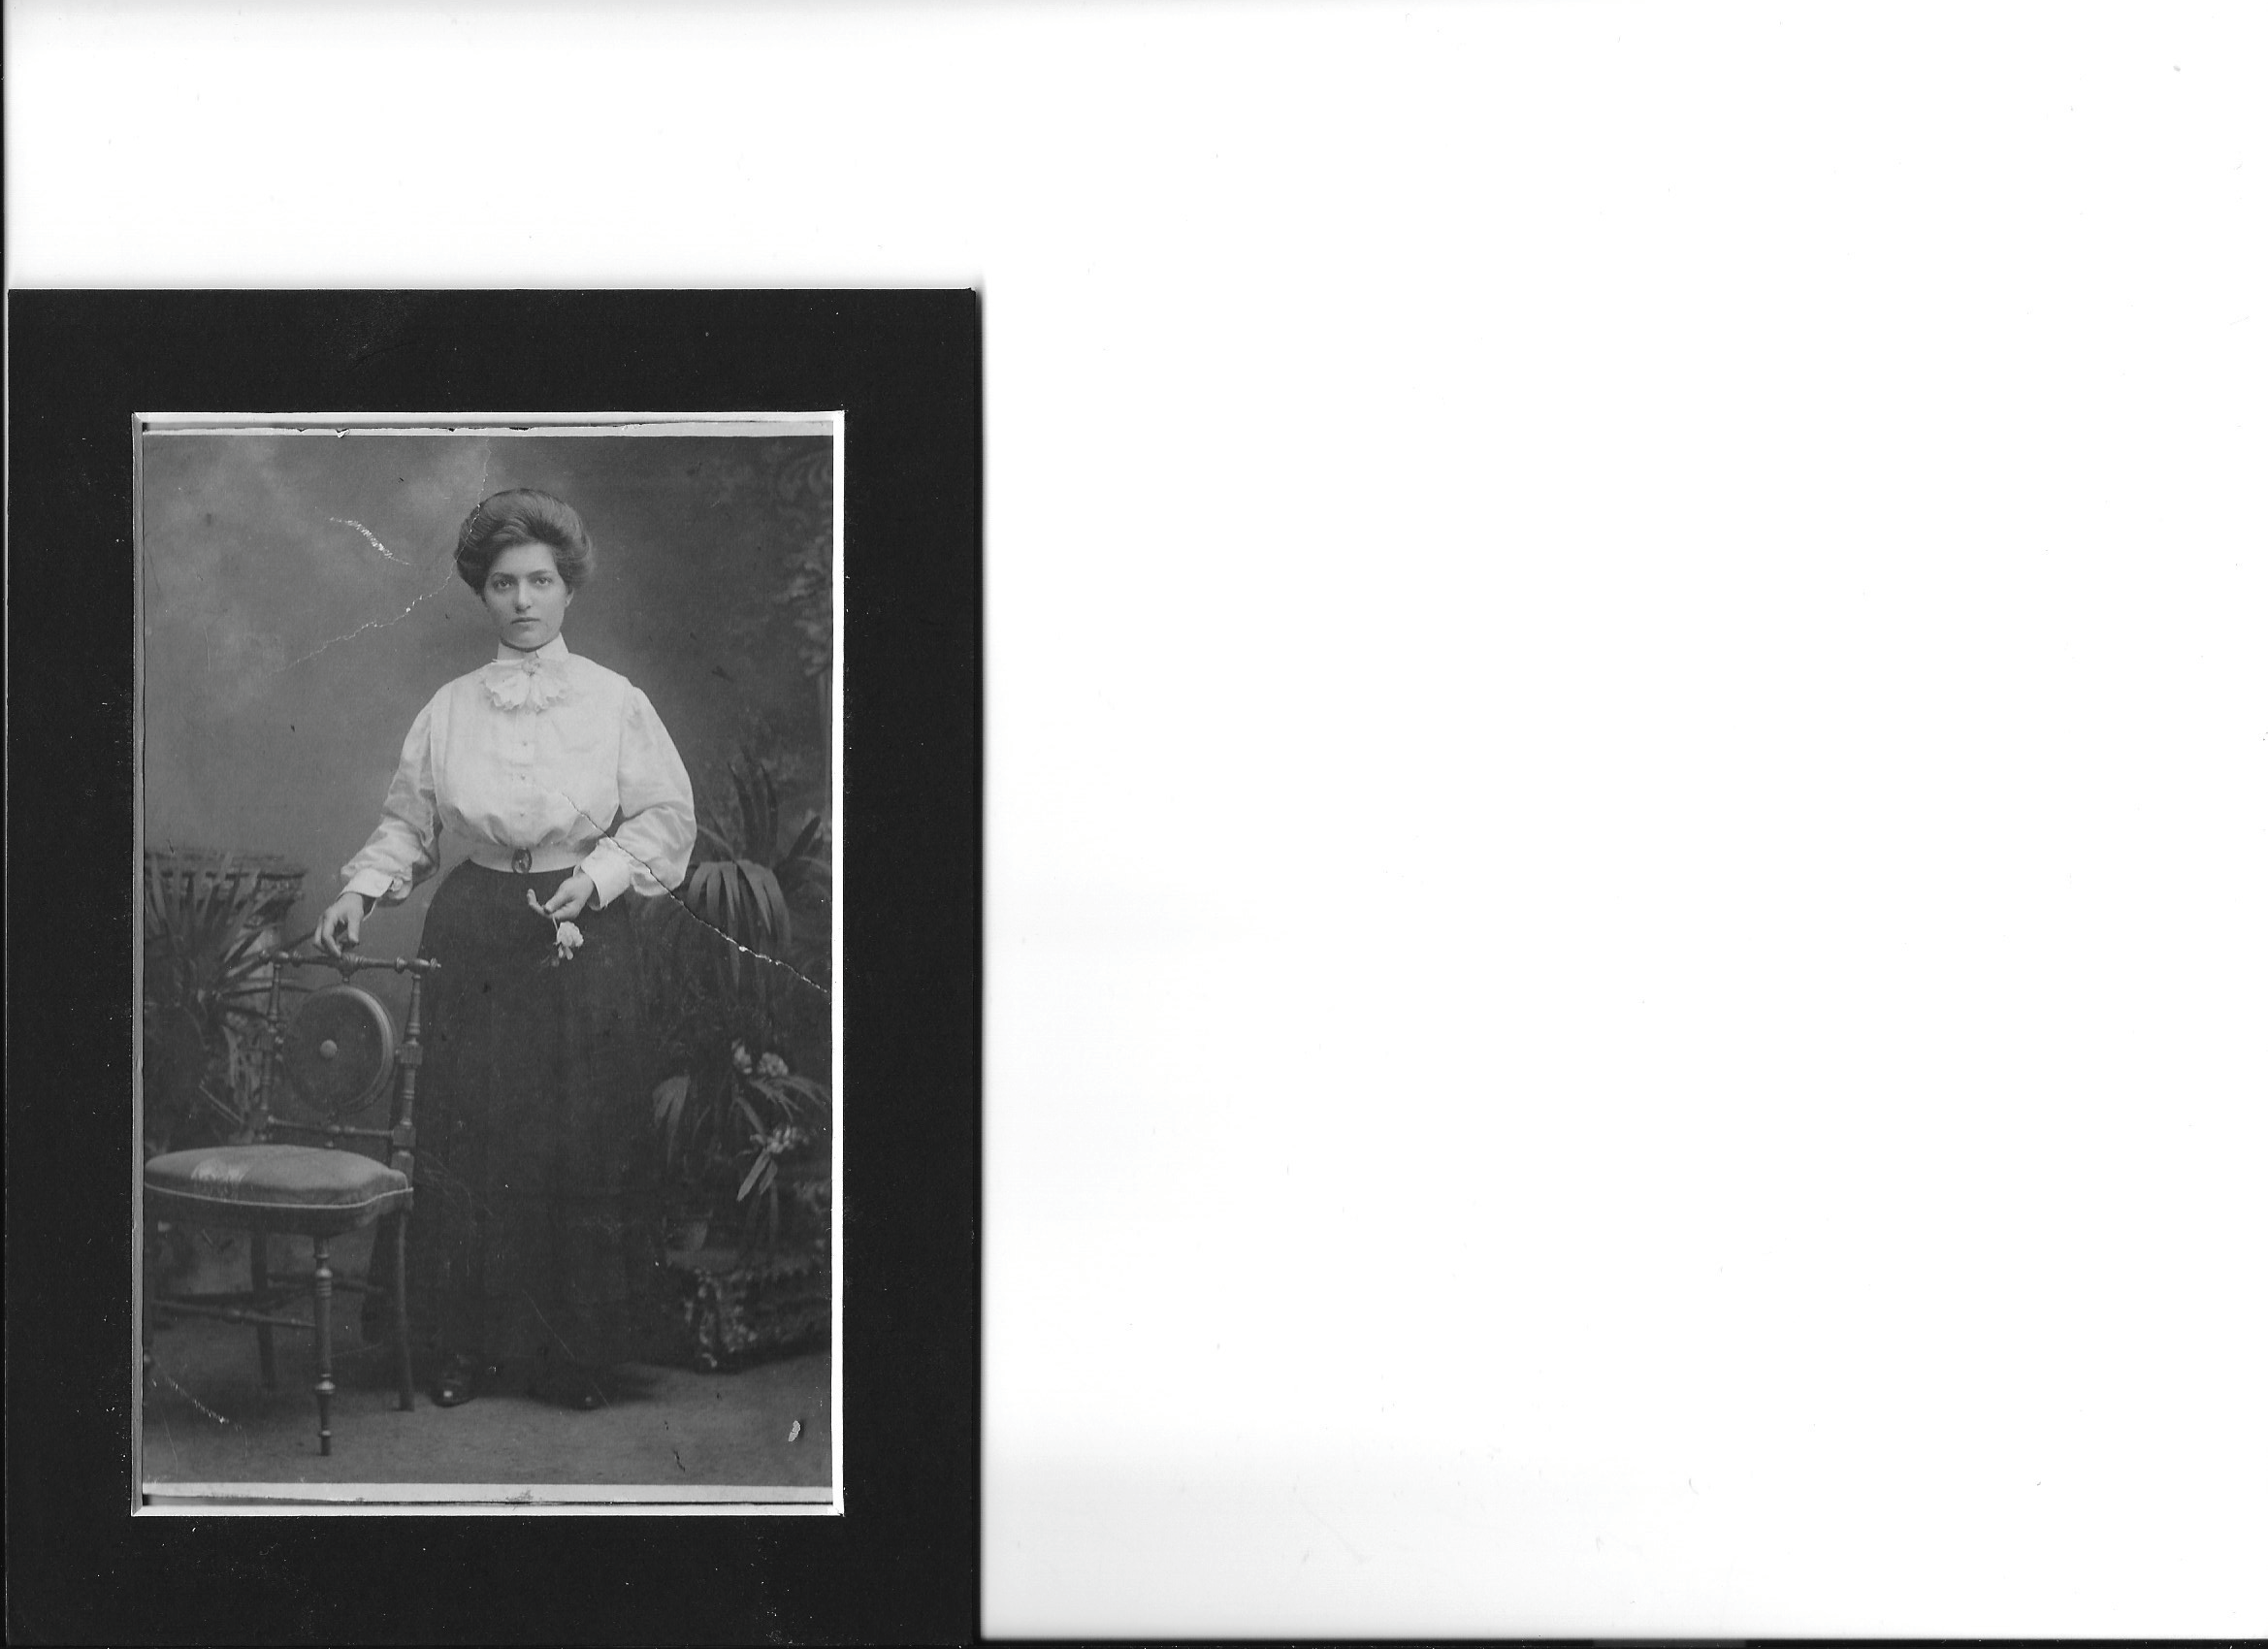 reading brings back memories of my grandparents and liberia